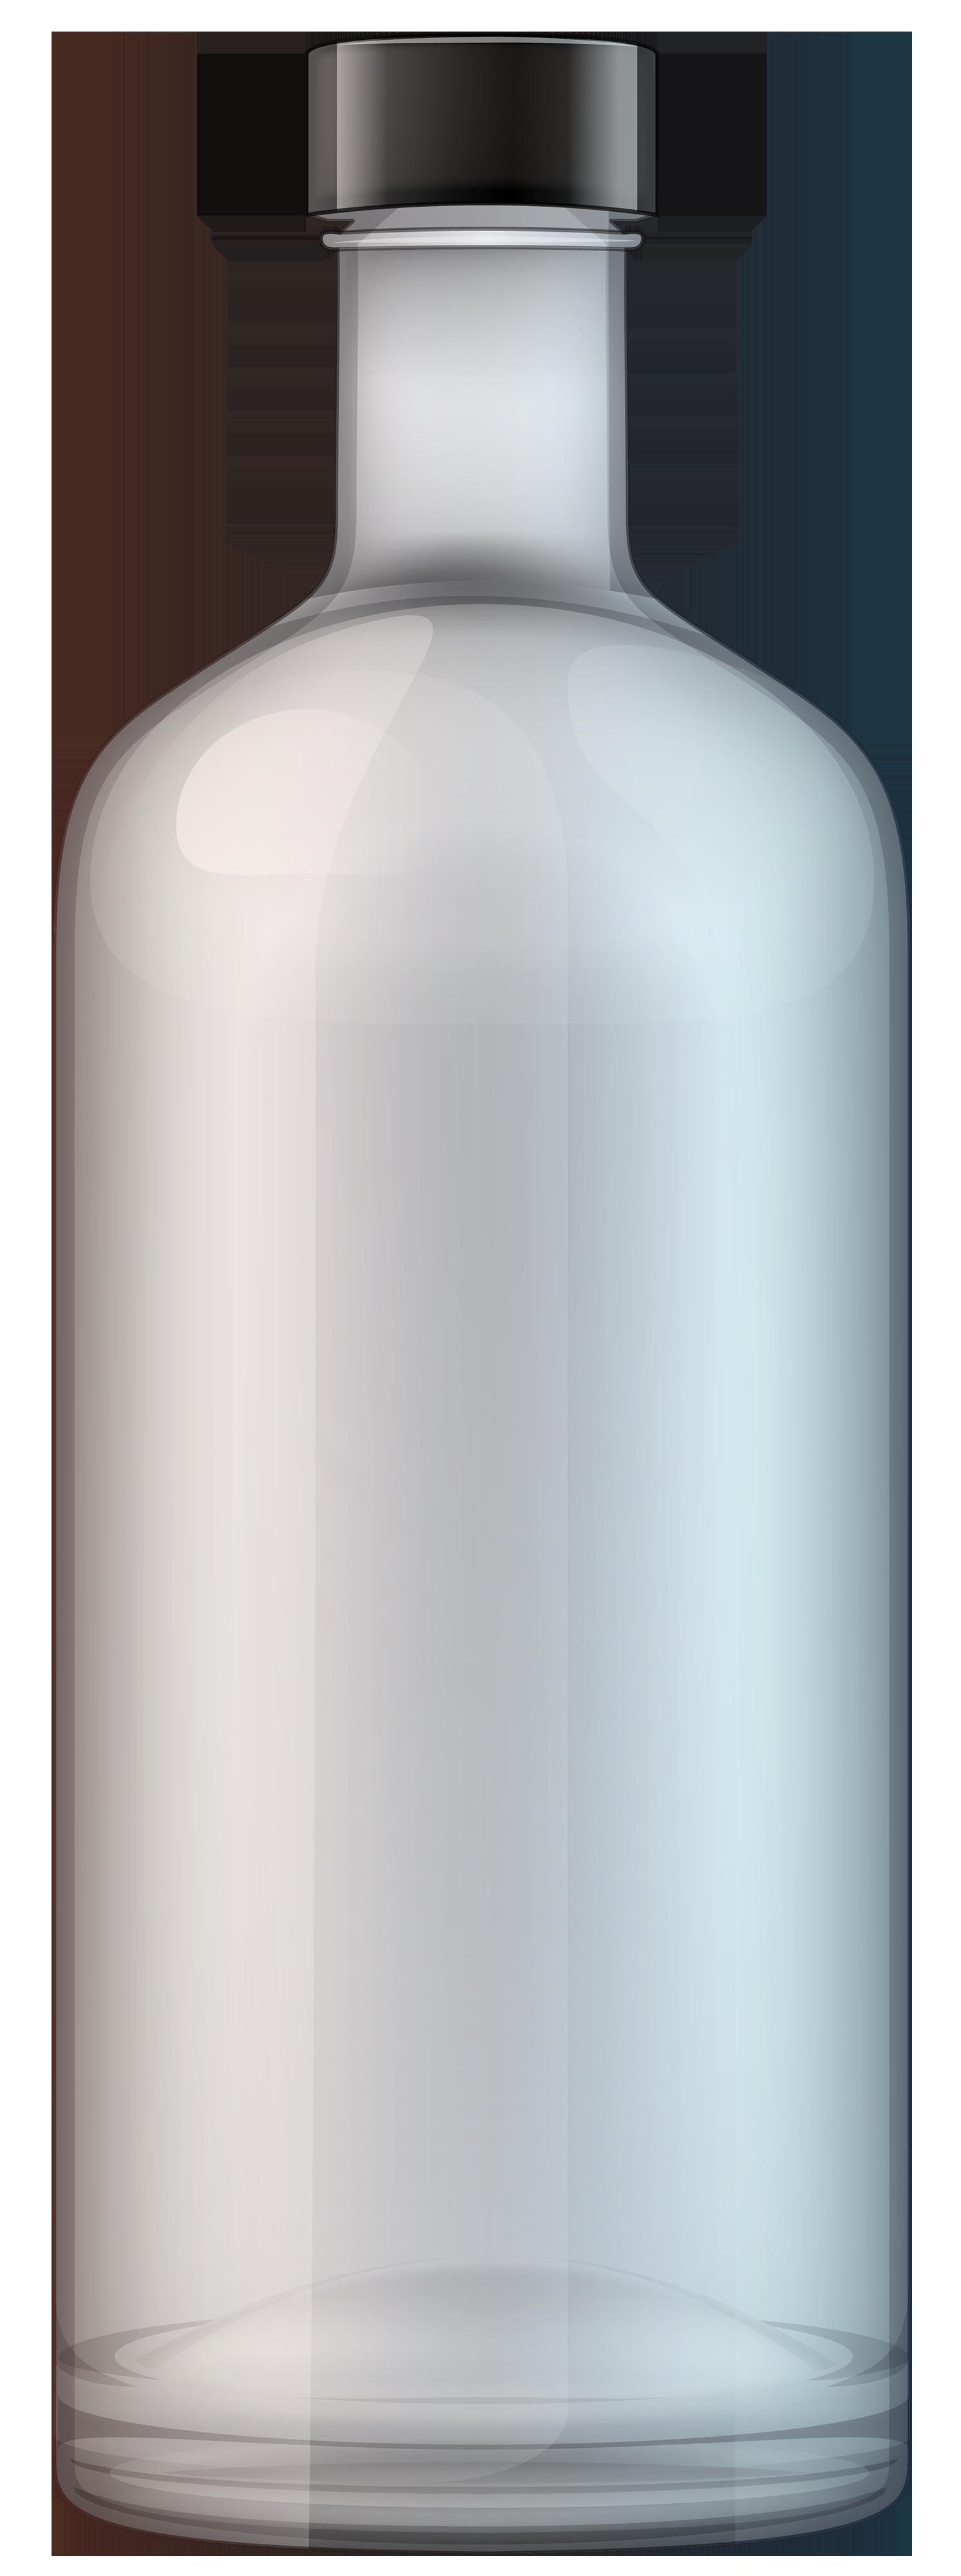 Vodka Bottle PNG Clipart.